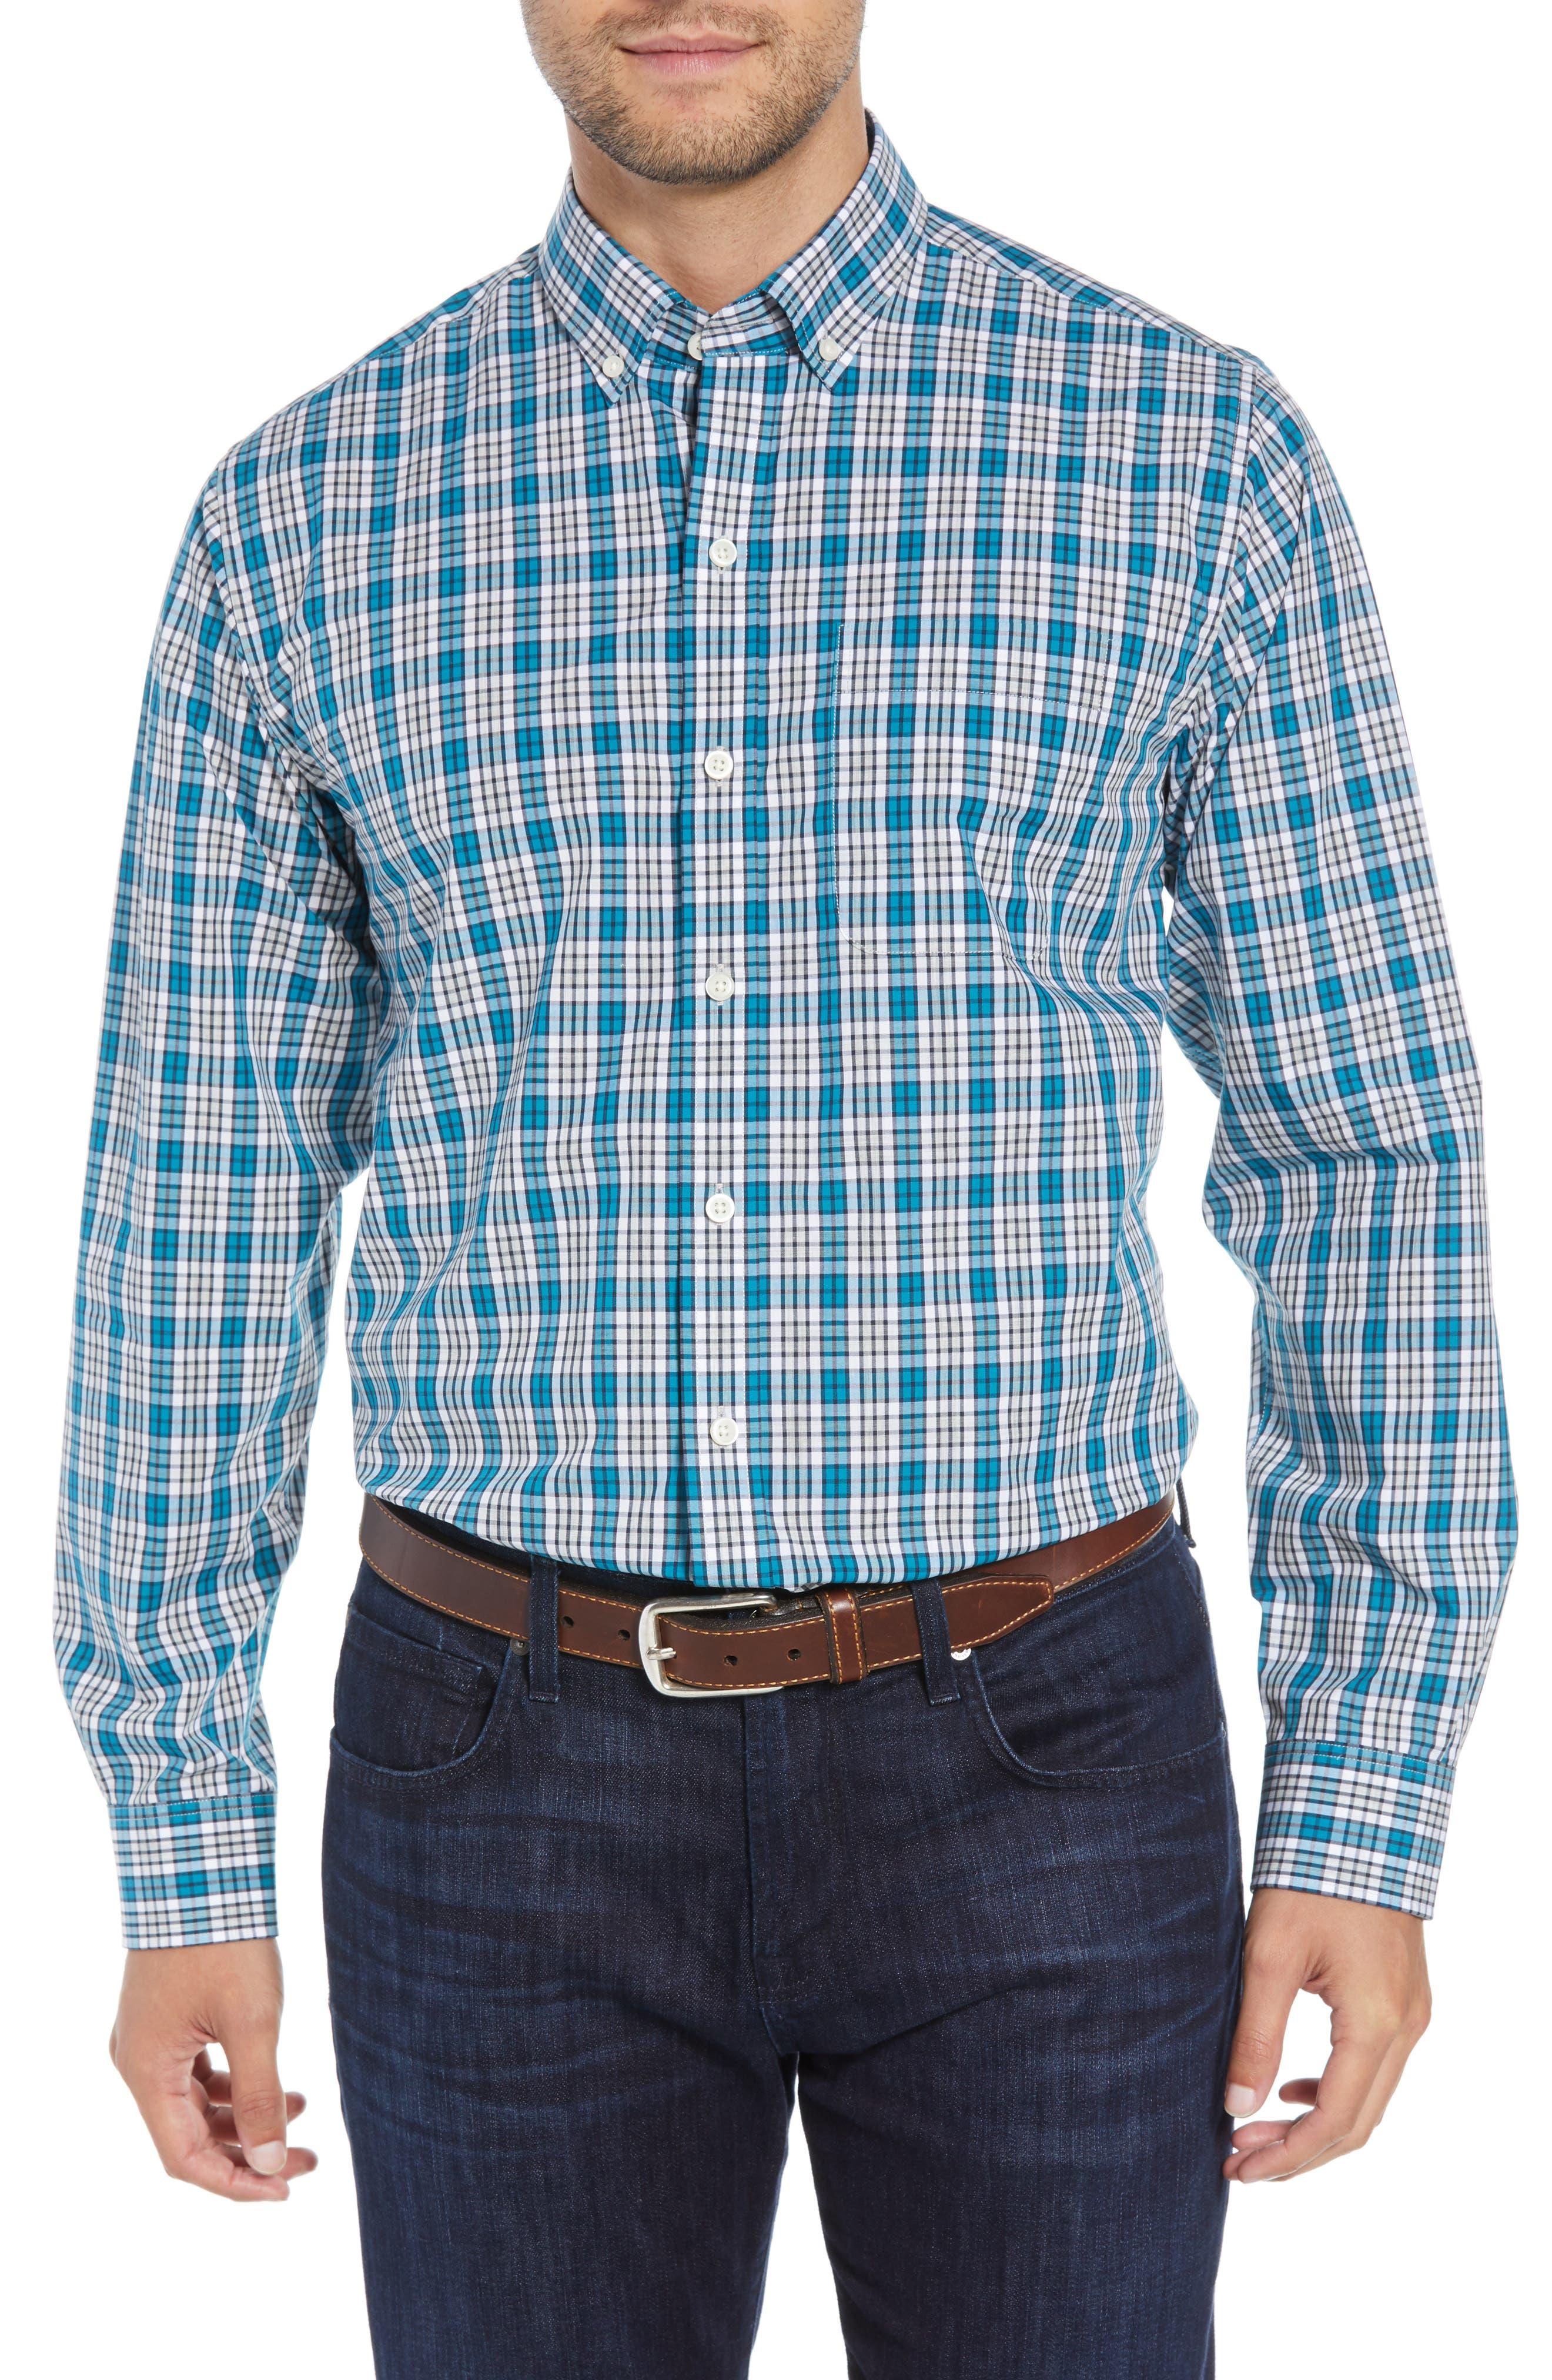 Harris Regular Fit Non-Iron Plaid Sport Shirt,                         Main,                         color, AQUATIC